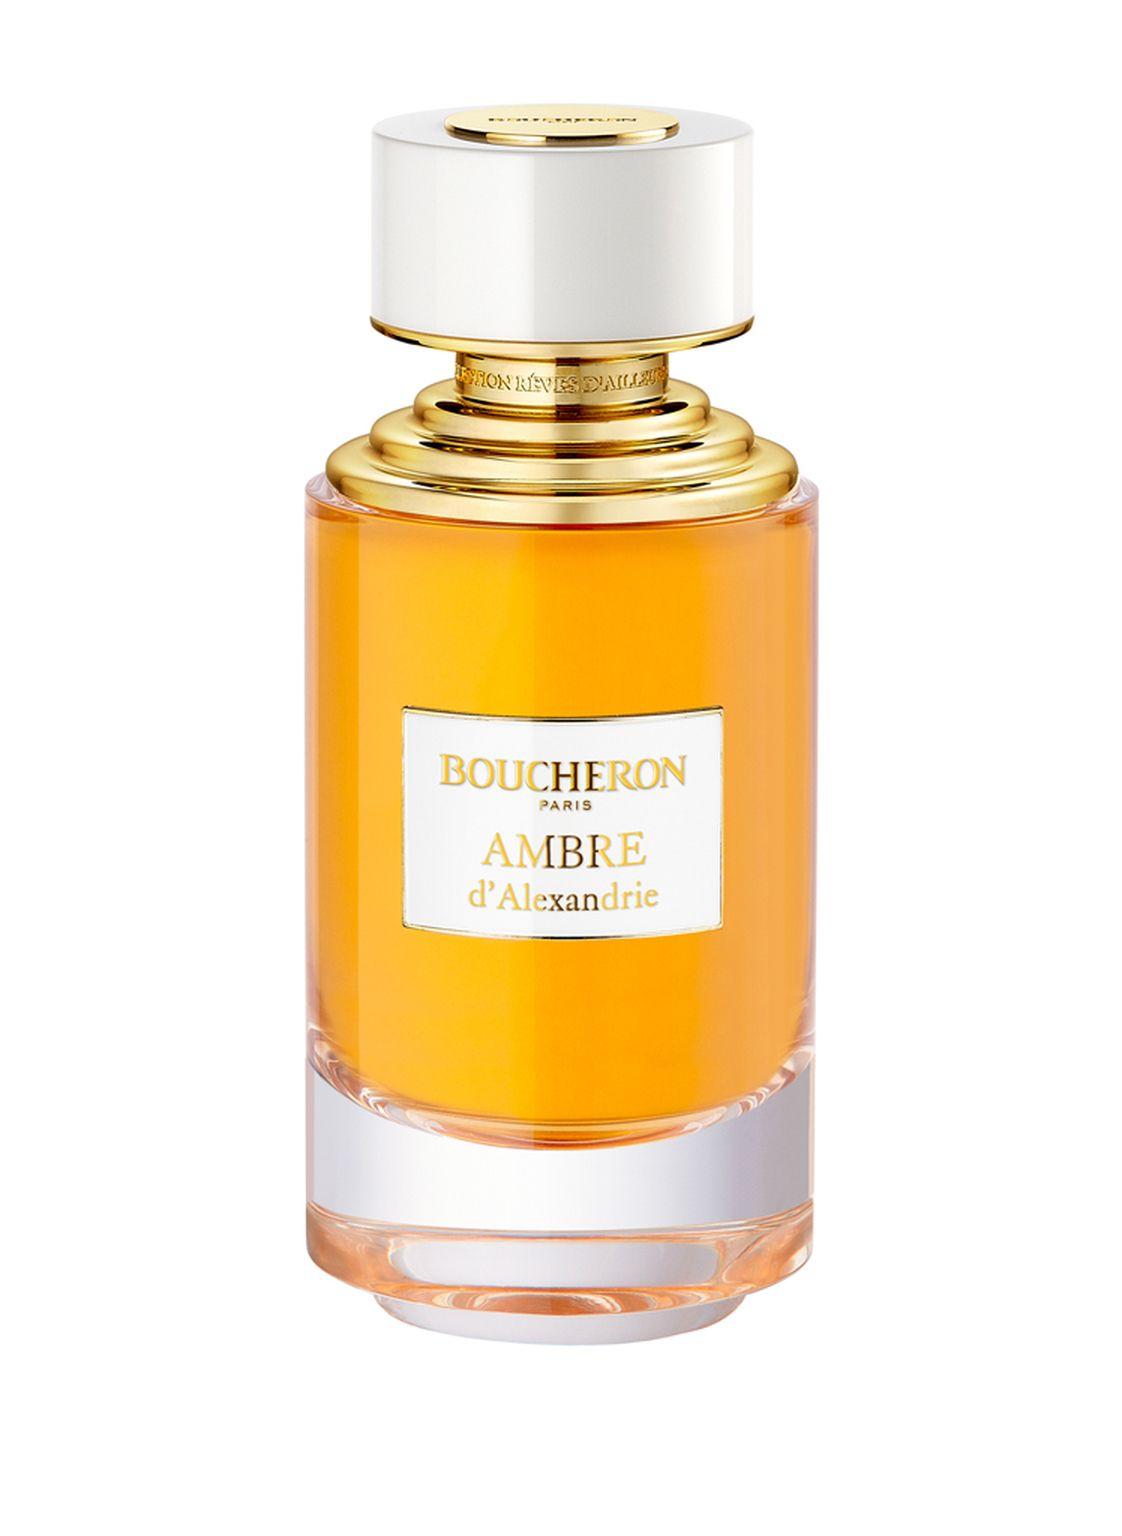 Boucheron Ambre D'alexandrie 125 ml (152,00 € / 100 ml)